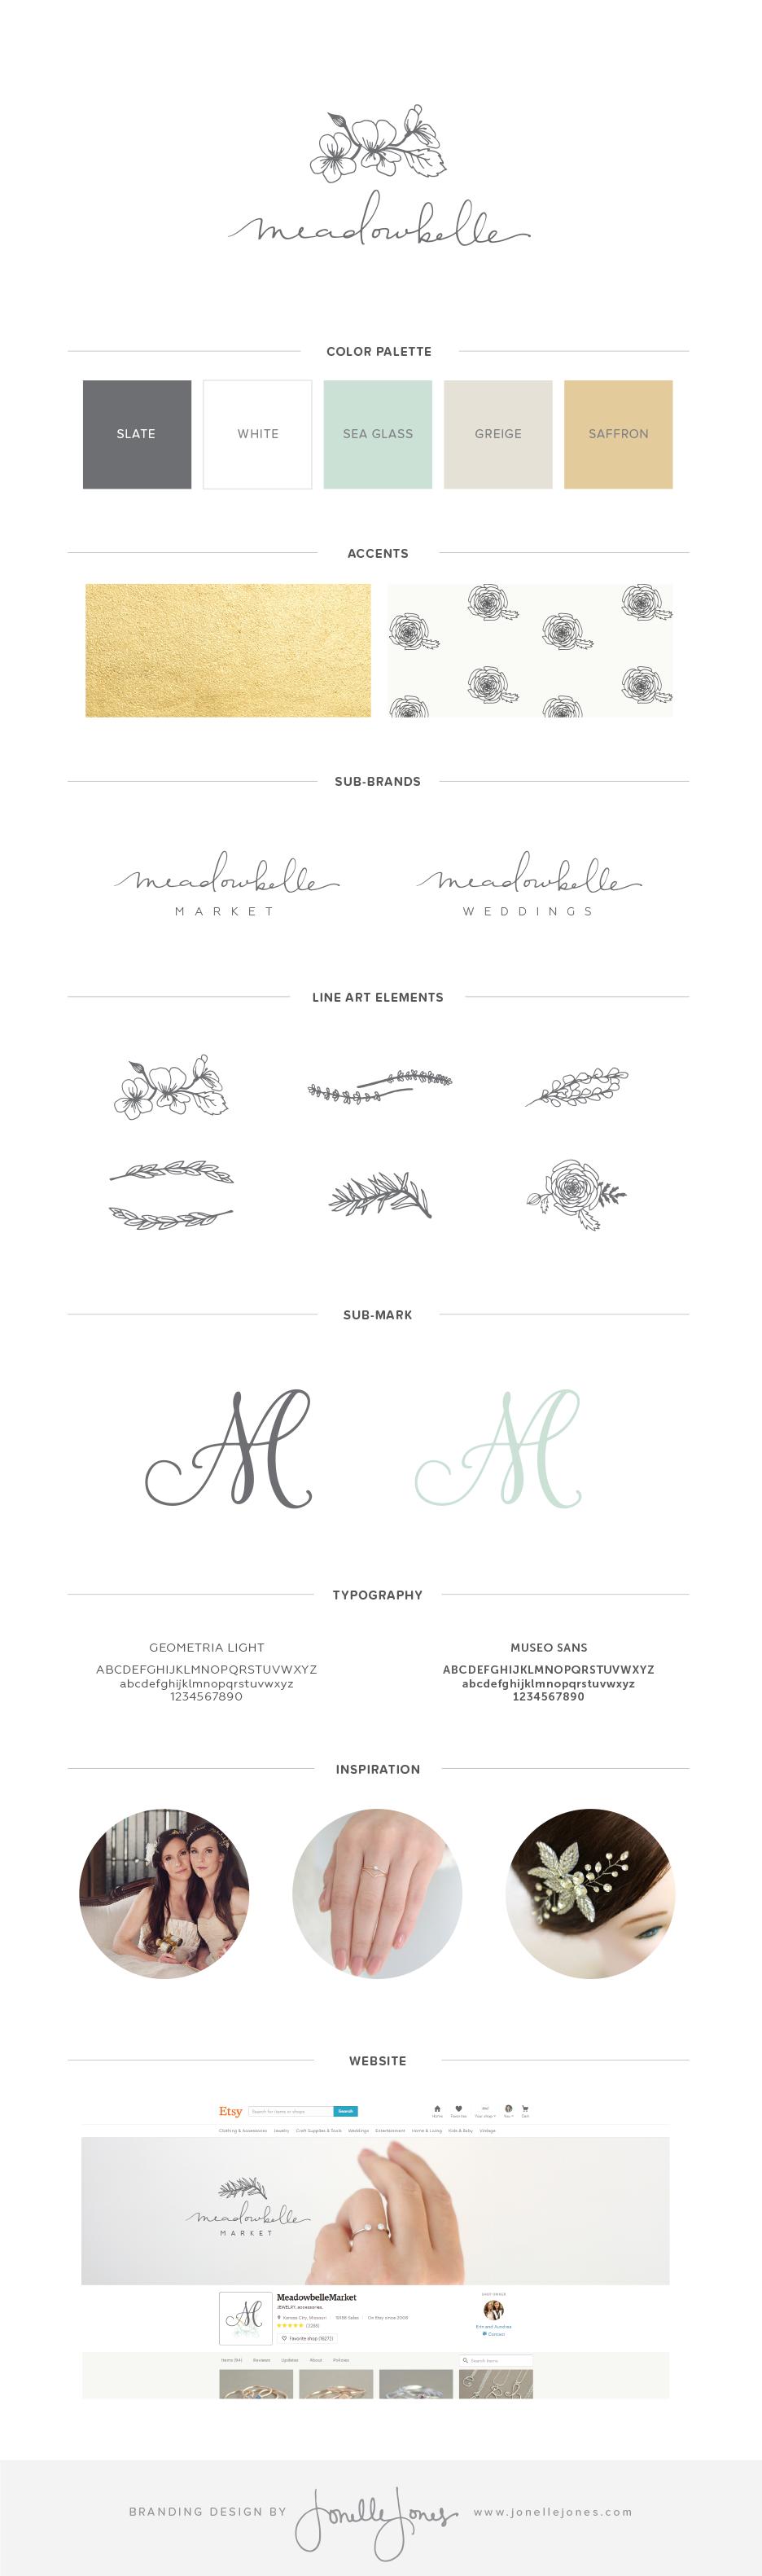 meadowbelle branding by jonelle jones creative